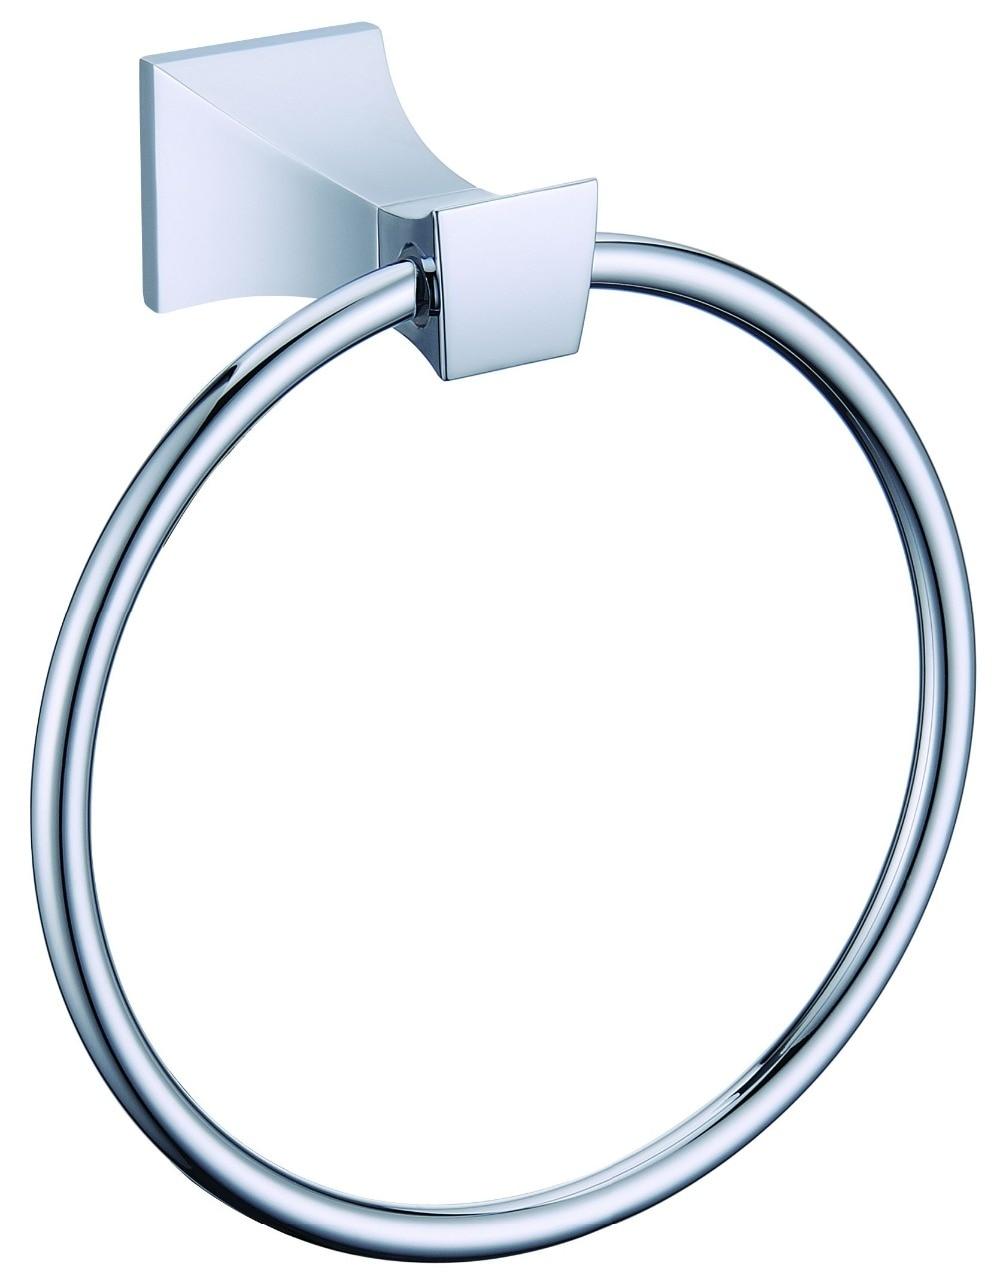 FREE SHIPPING chrome  Square design  towel ringFREE SHIPPING chrome  Square design  towel ring